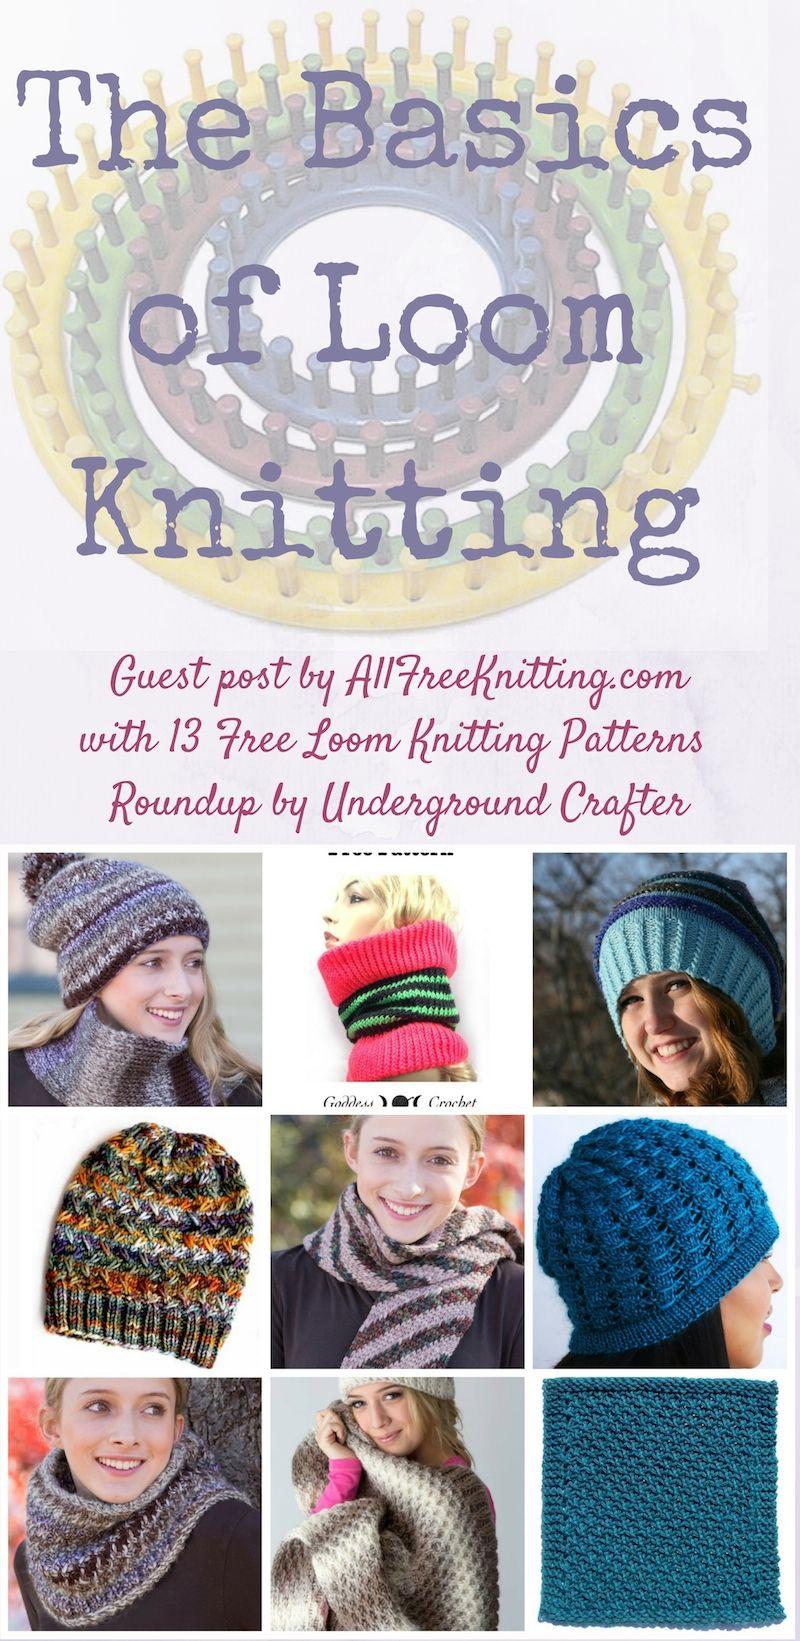 The Basics of Loom Knitting by AllFreeKnitting for Underground ...